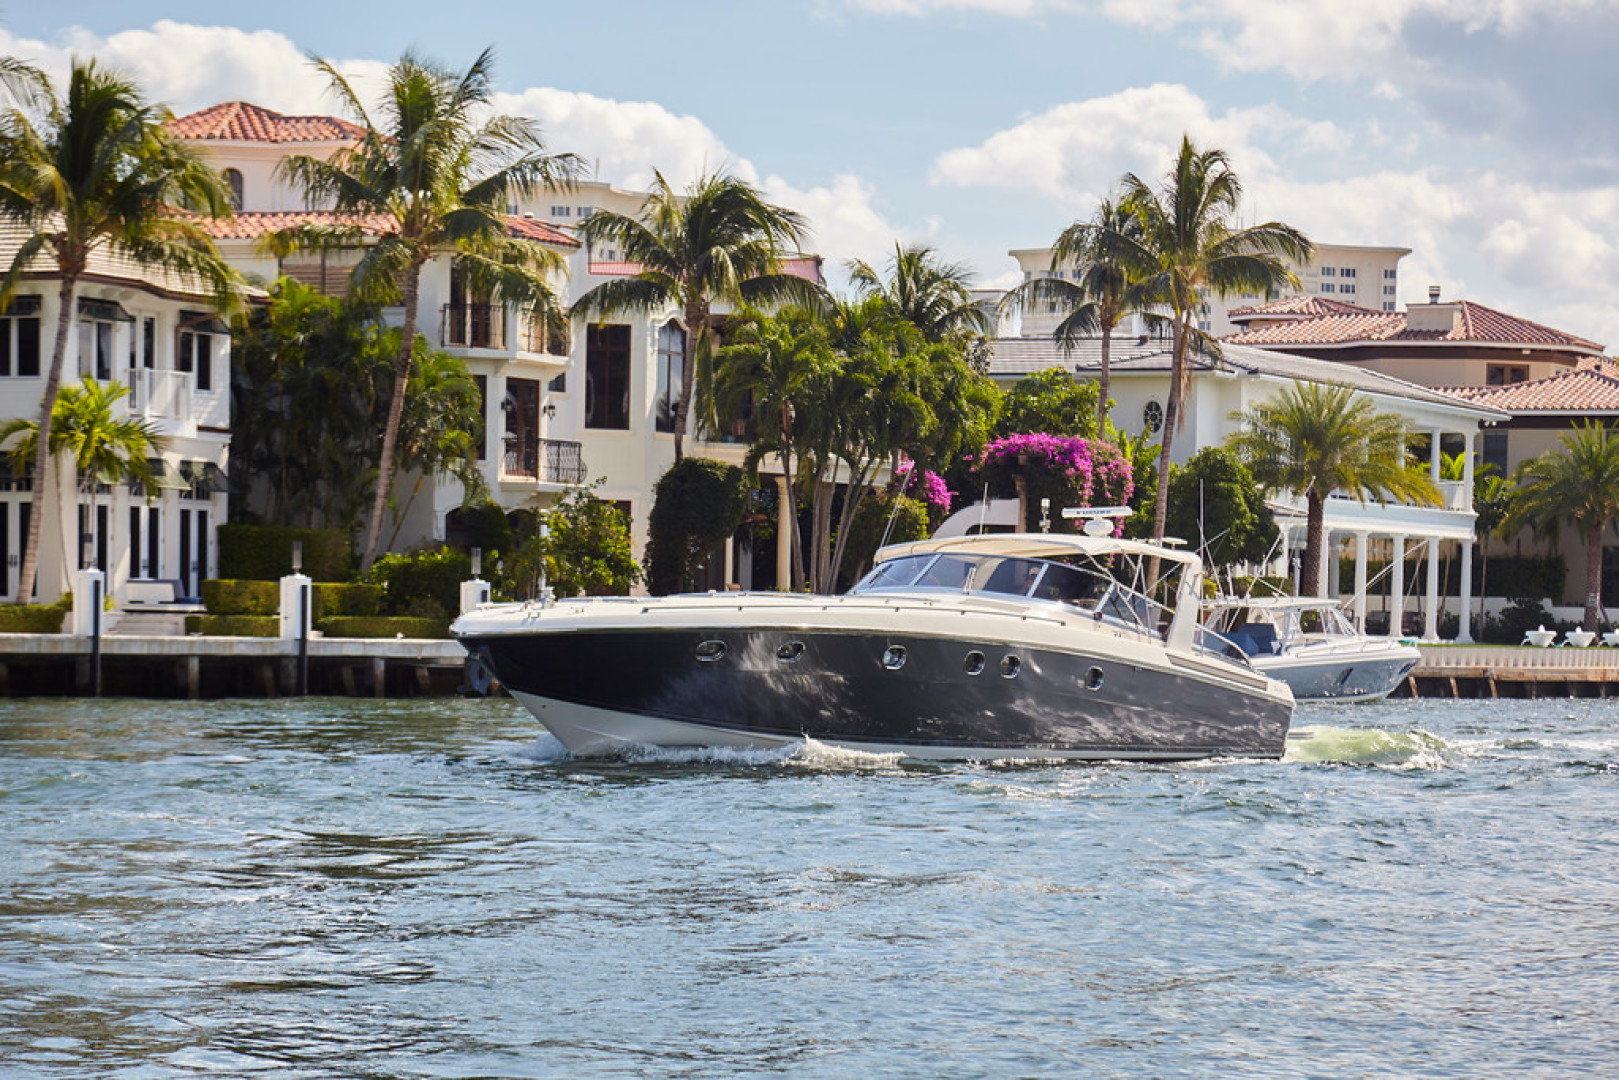 Baia-Sports Cruiser 1998 -Fort Lauderdale-Florida-United States-1275571 | Thumbnail